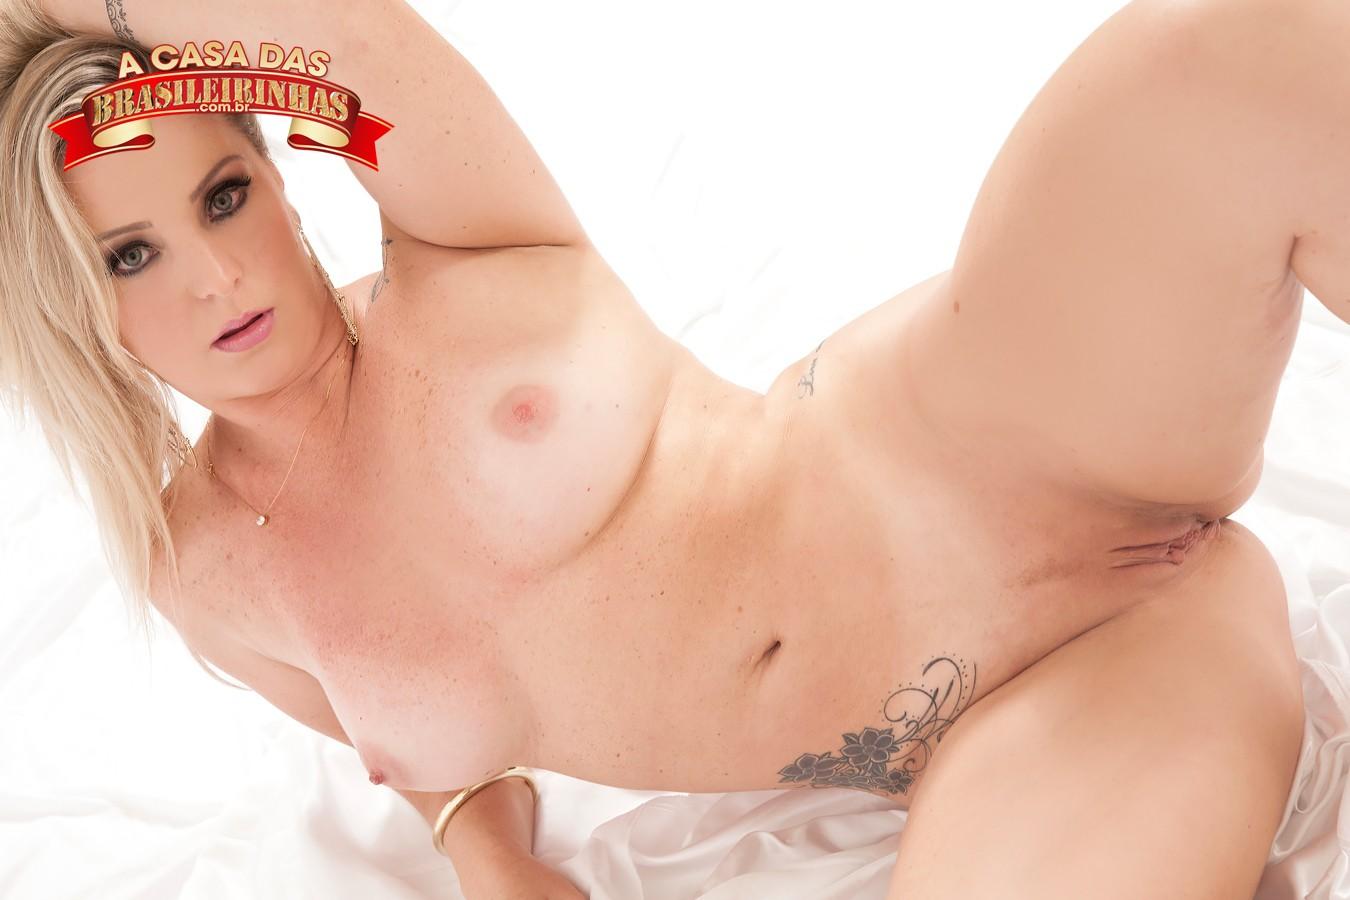 milena-santos-gostosa-atriz-famosa-brasileirinhas.jpg